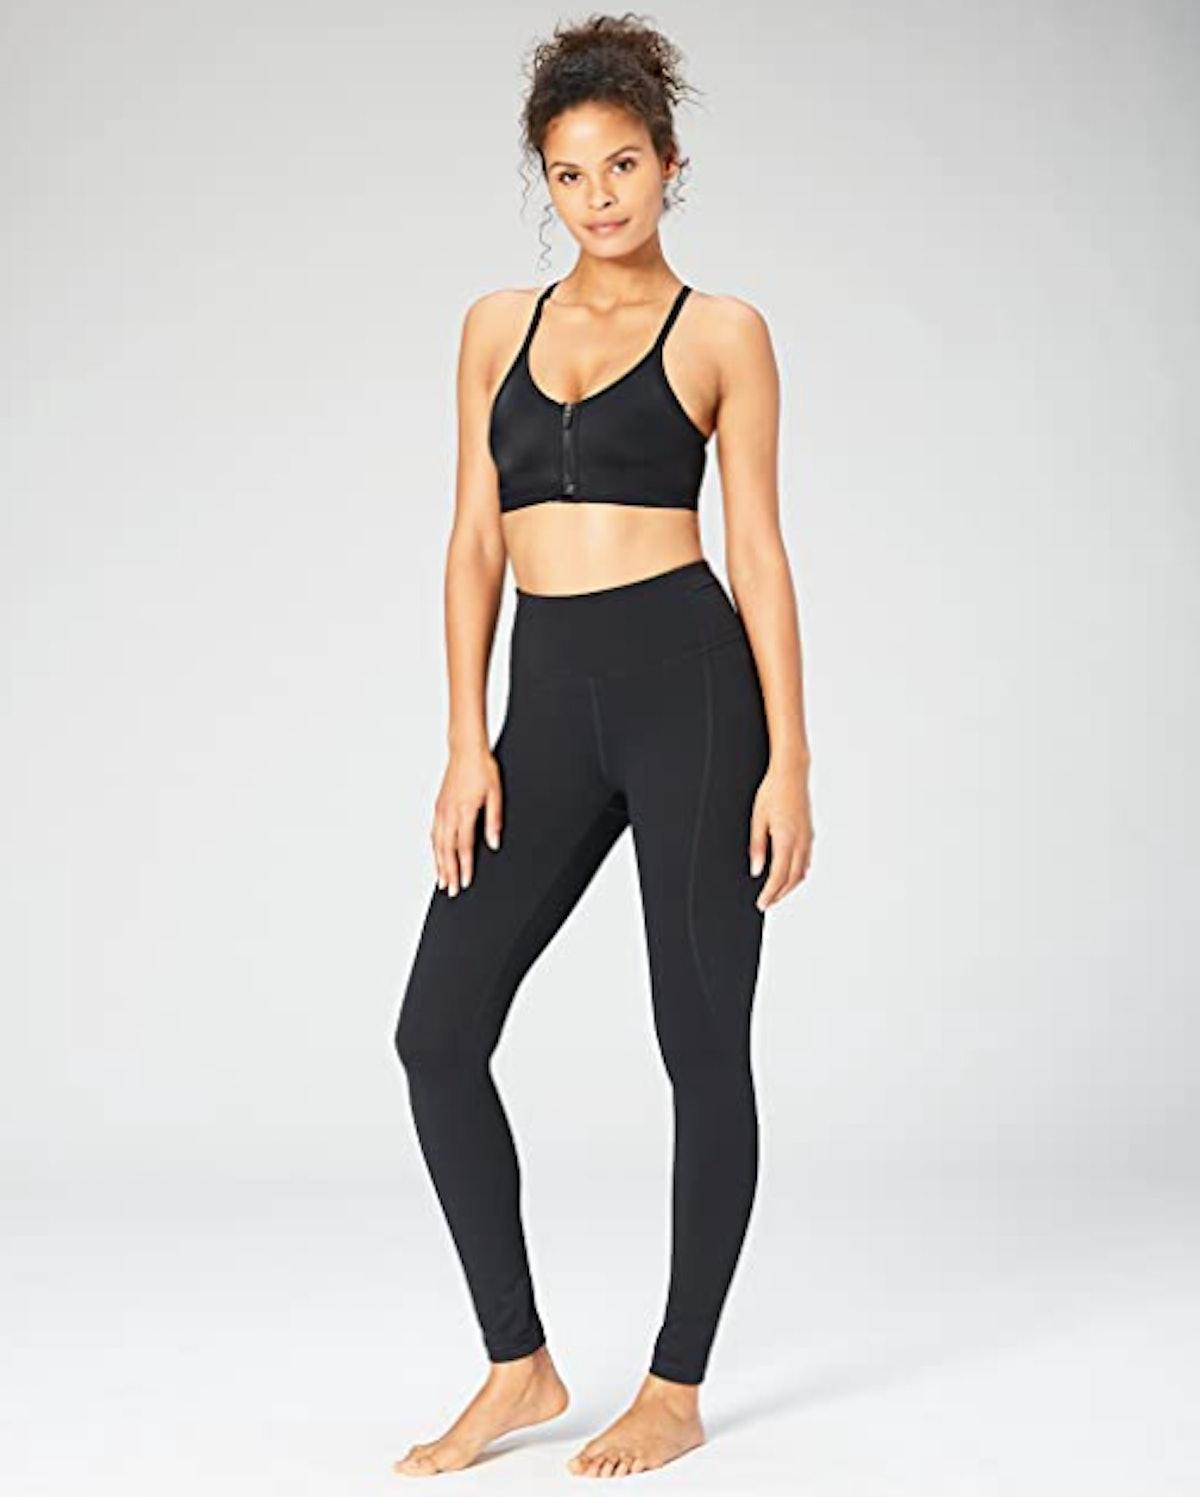 Core 10 'Build Your Own' Yoga Pants